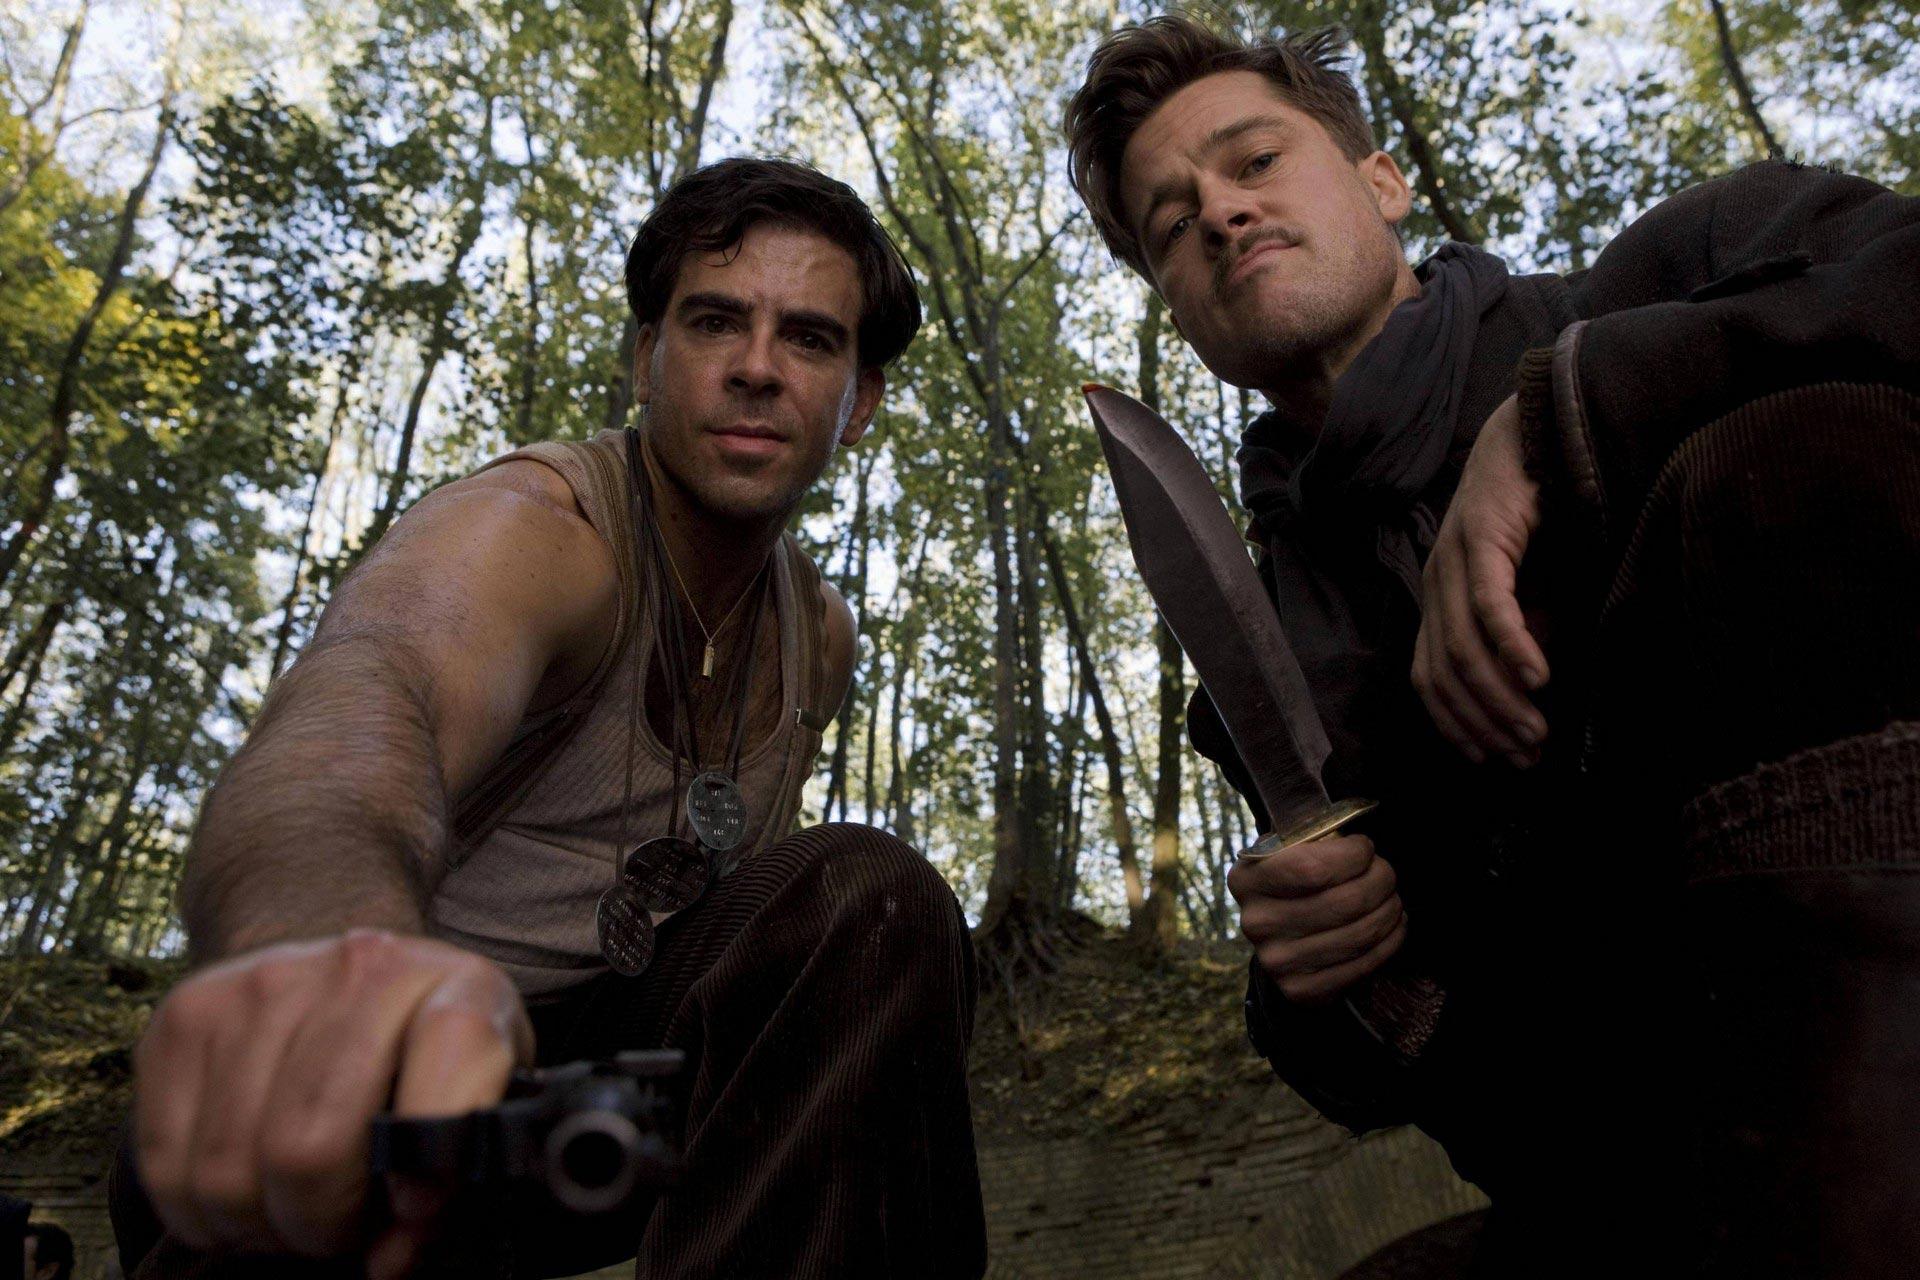 Inglourious Basterds (2009, The Weinsteinpany)